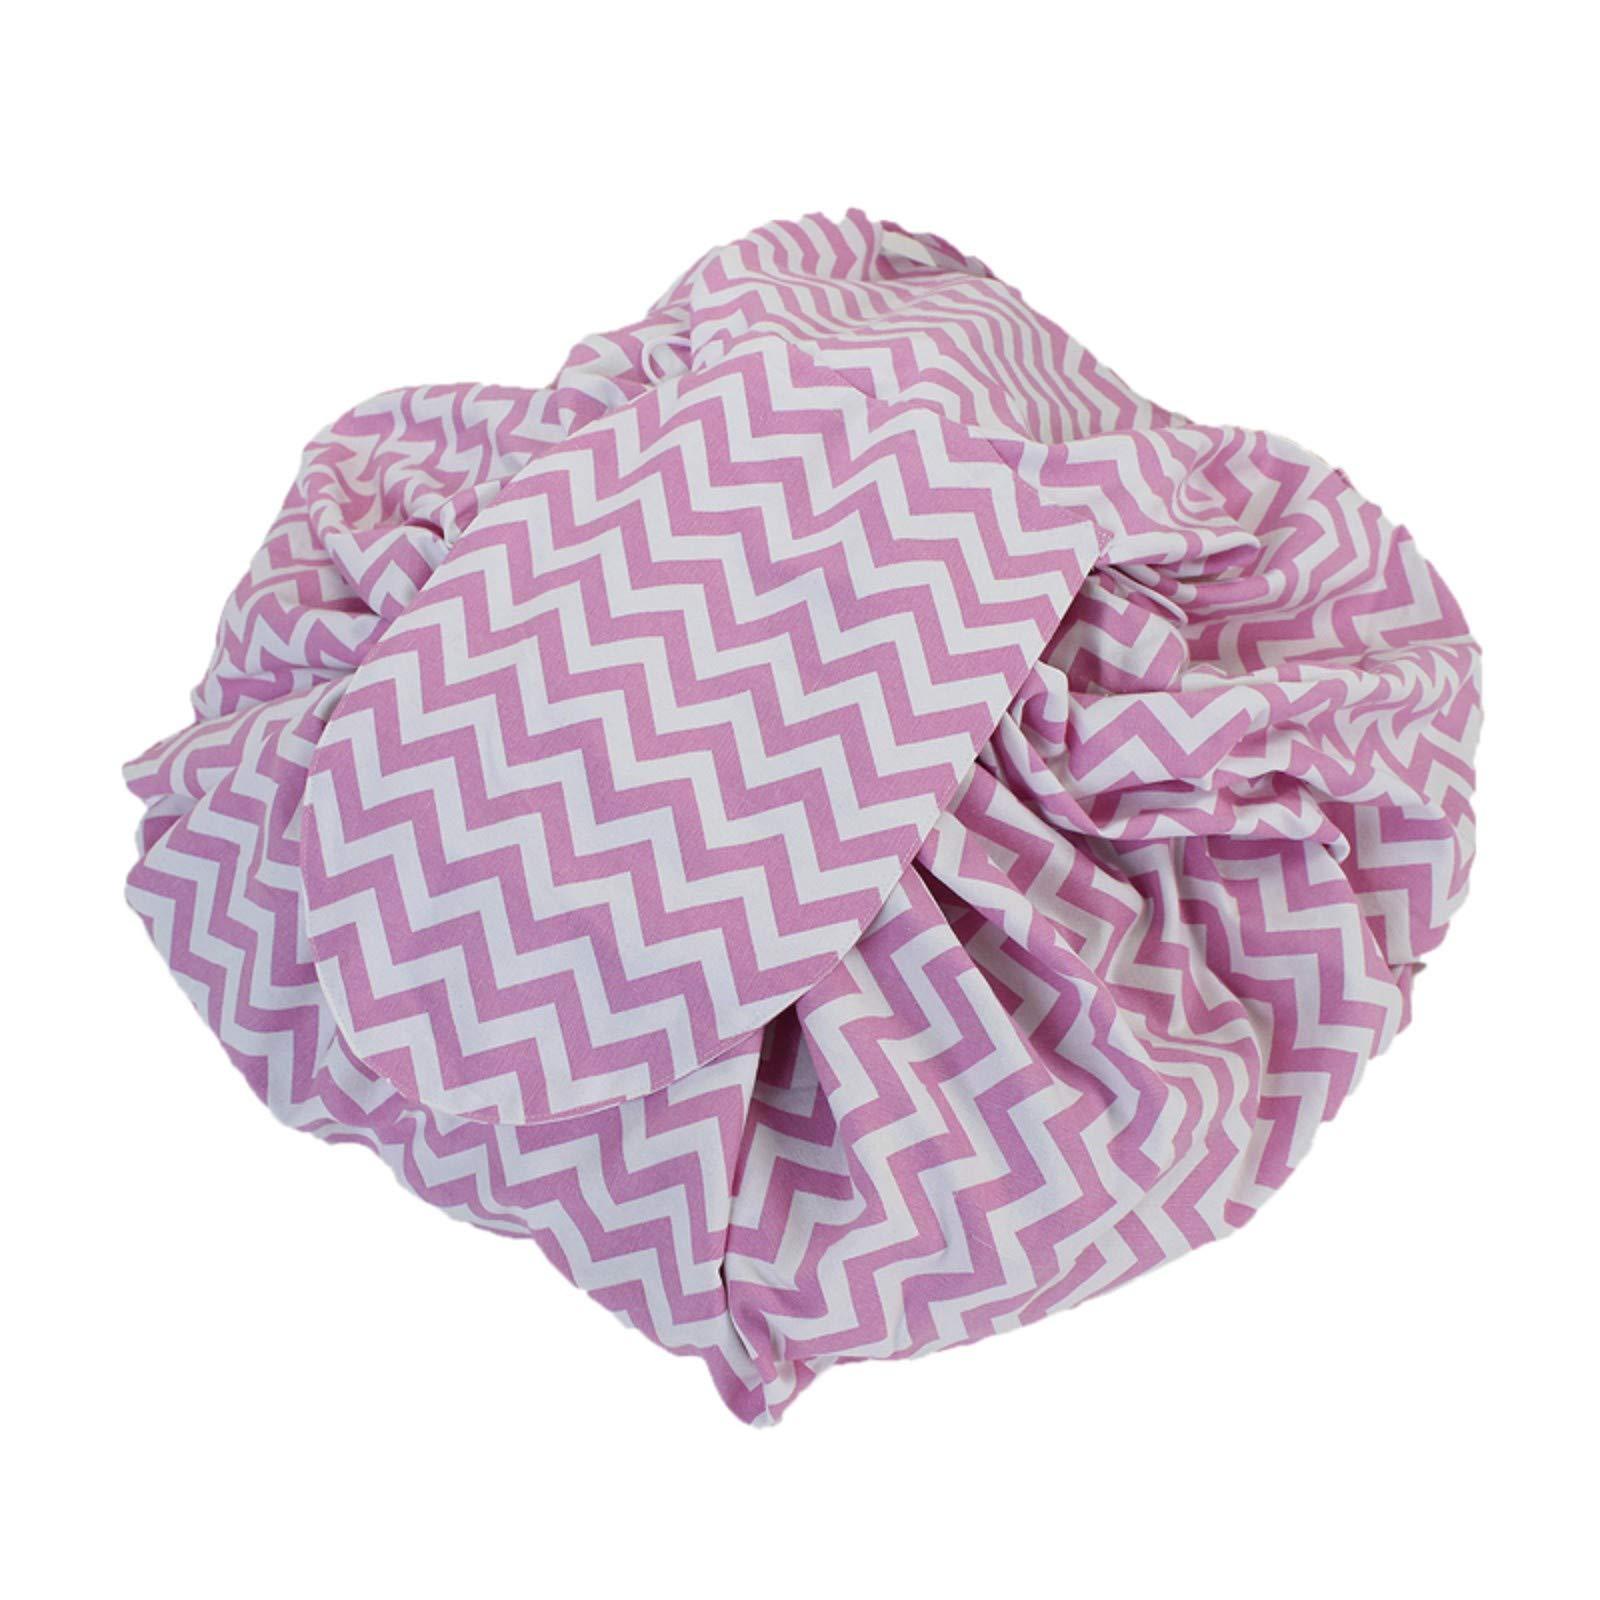 MZS Tec Kids Toys Storage Bag, Foldable Drawstring Plush Animal Stuffed Toys Bag Home Organizer Bulk Accessories (L, F Stripe Pink)